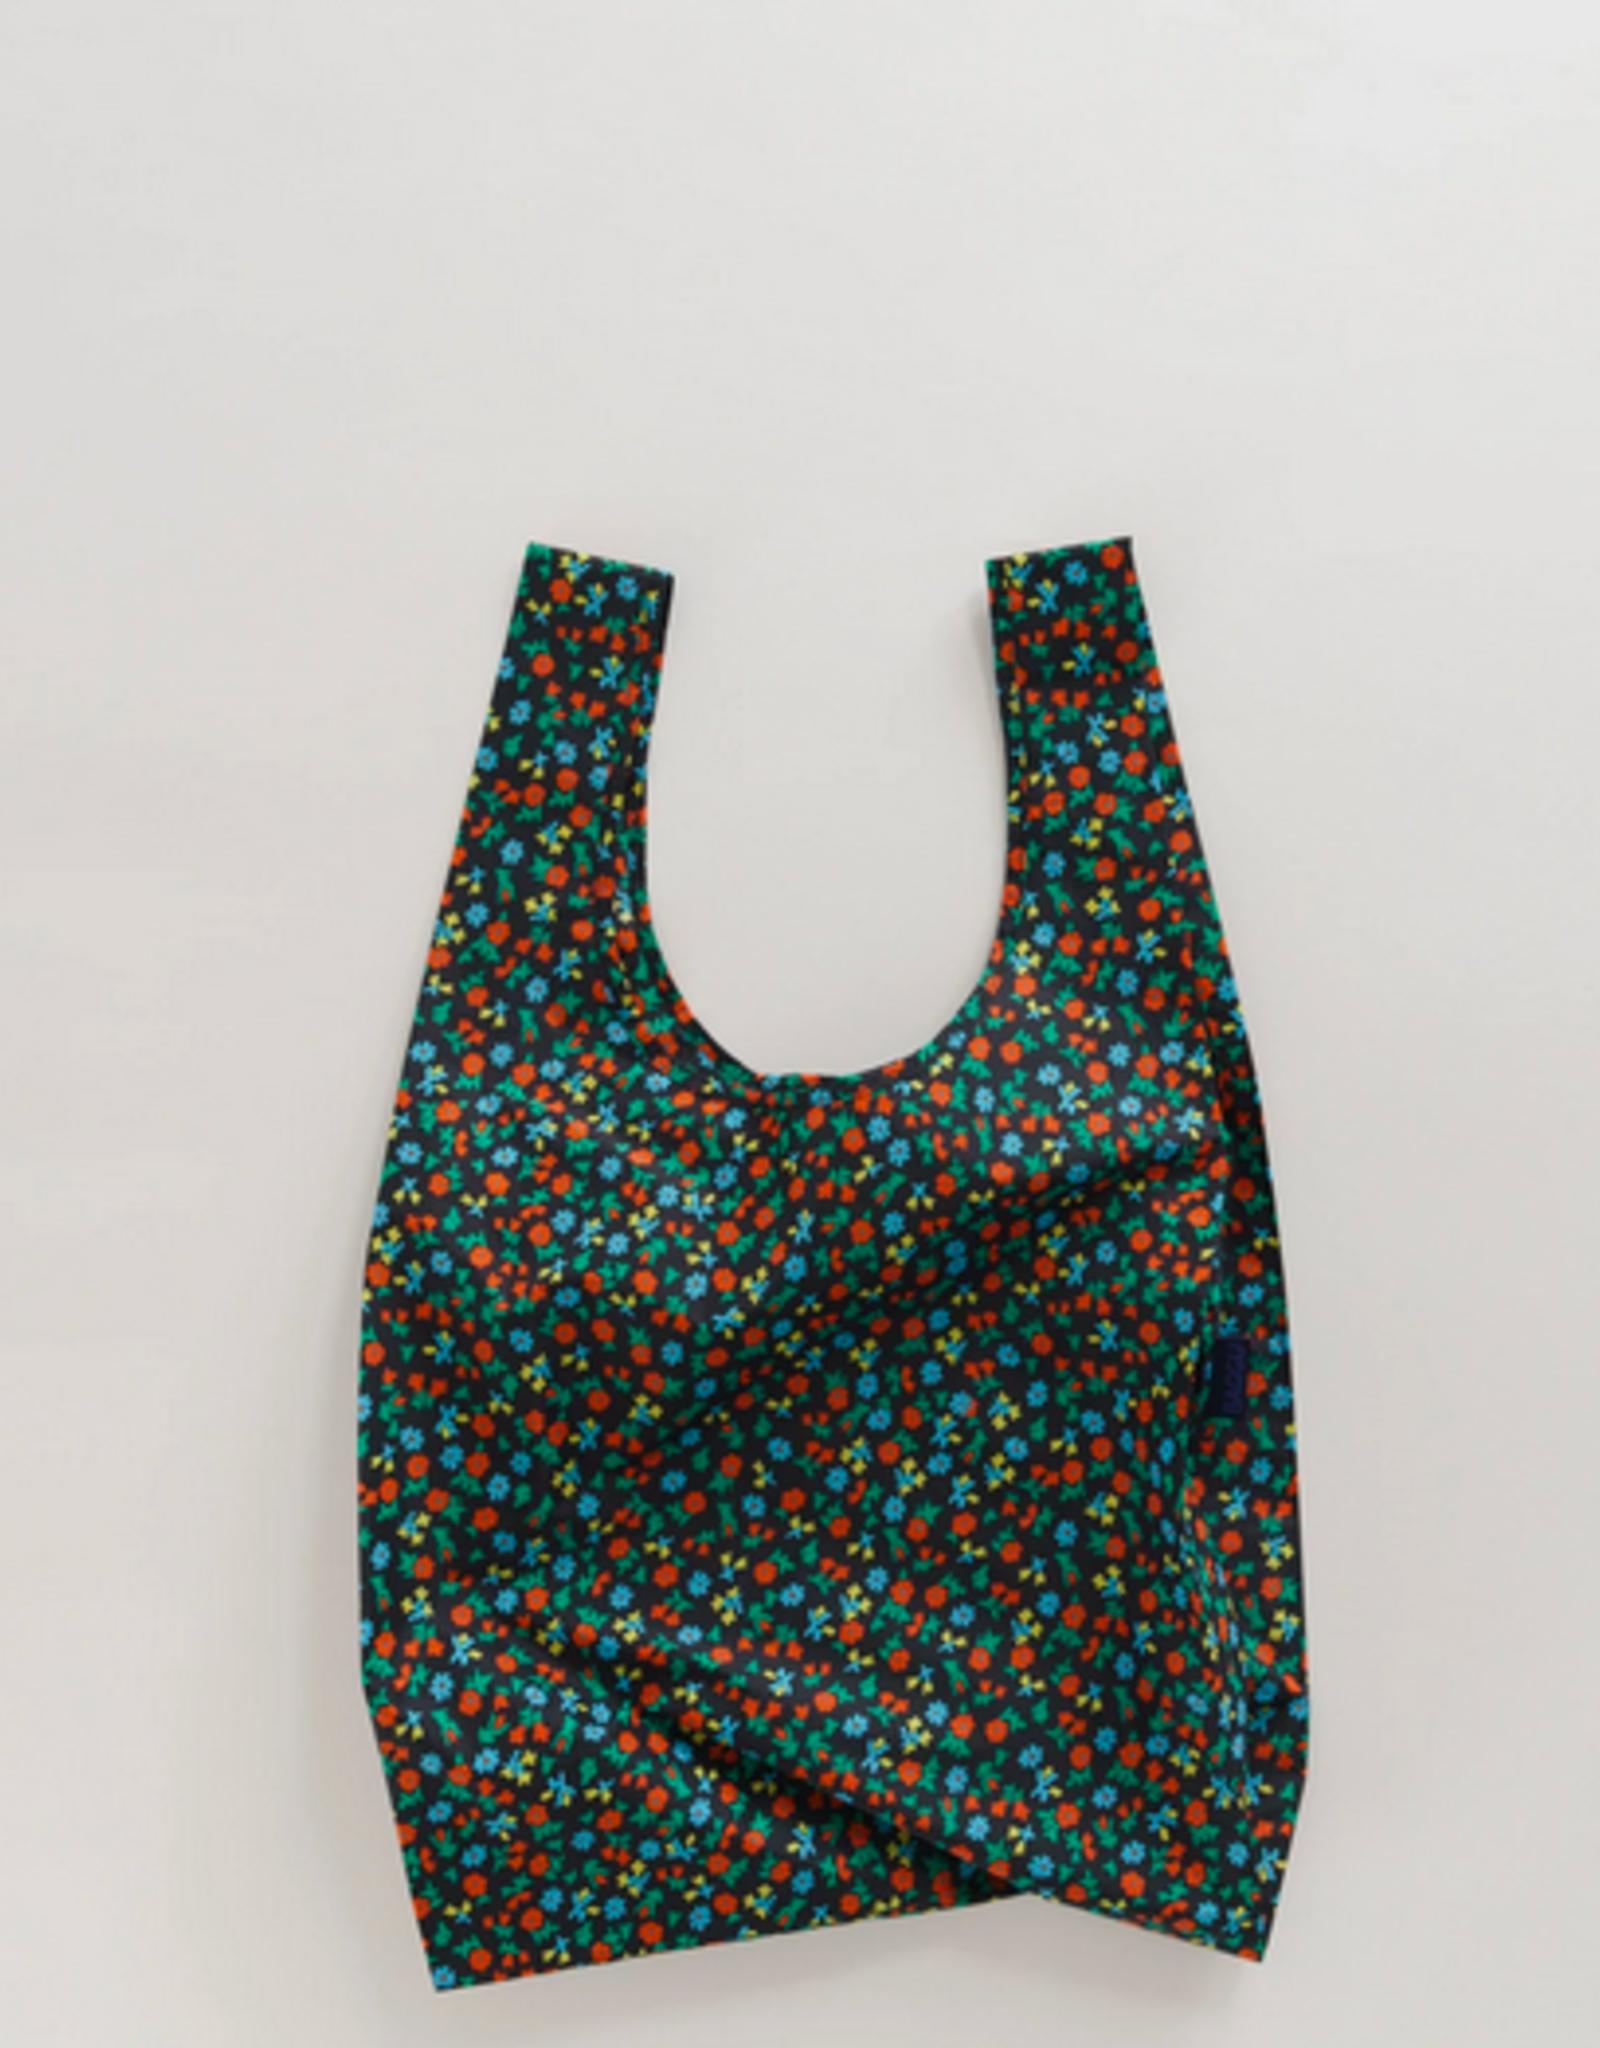 Baggu Standard reusable bag black calico floral